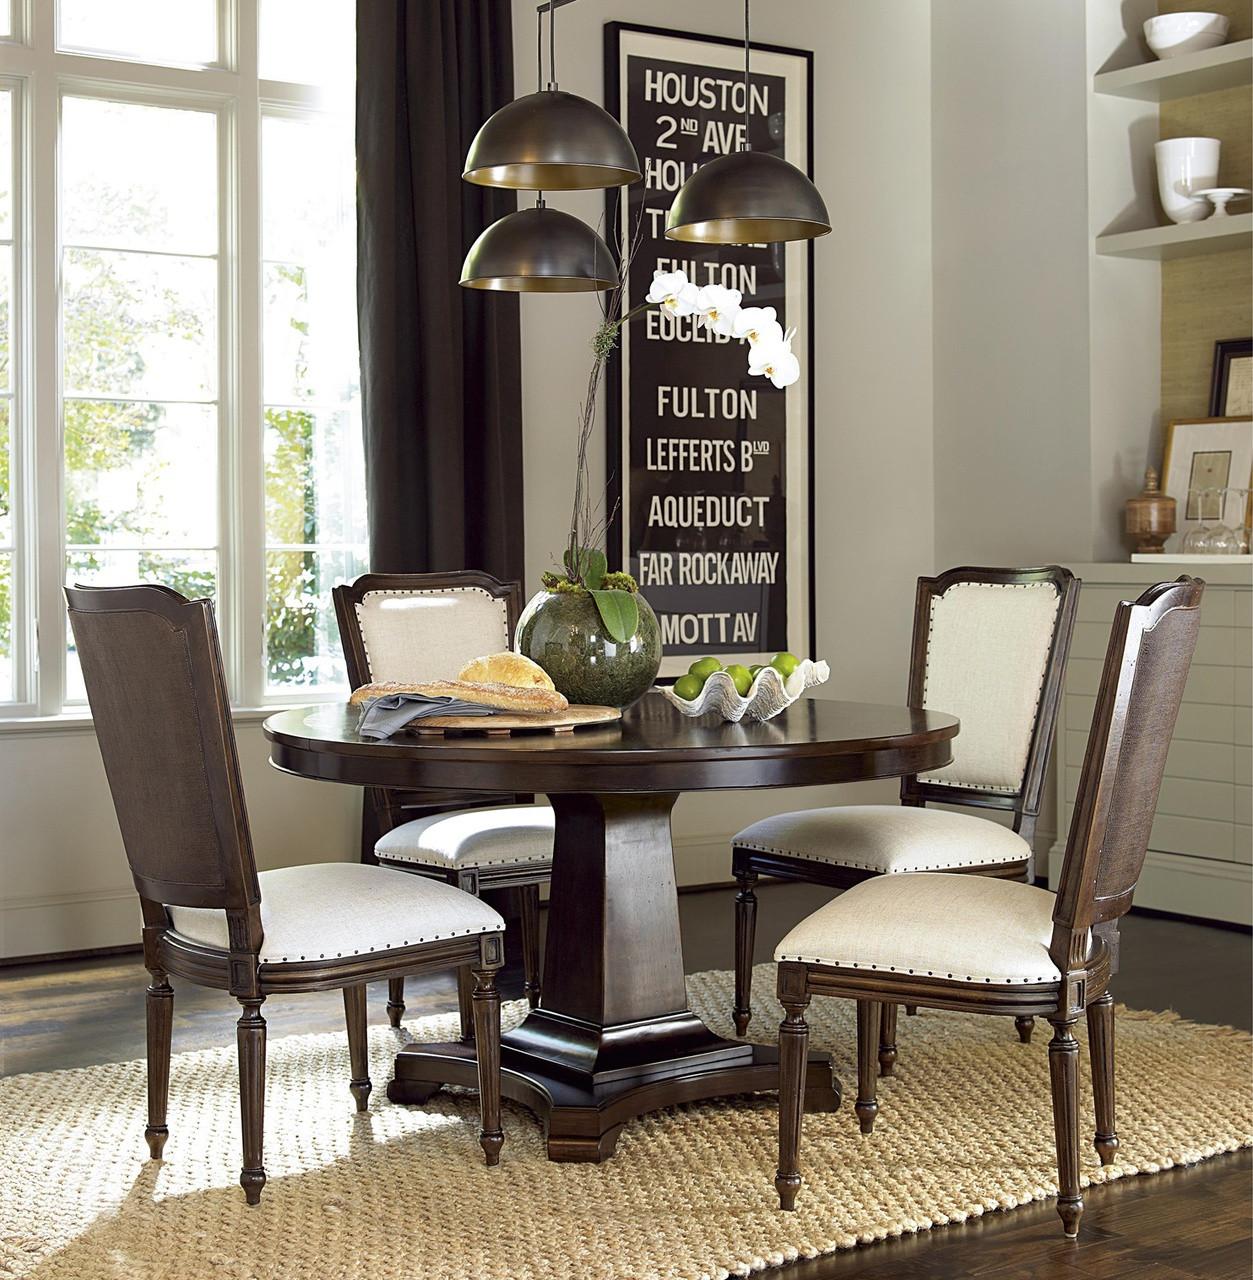 Astonishing Proximity Cherry Wood 5 Piece Round Dining Room Set Home Interior And Landscaping Transignezvosmurscom